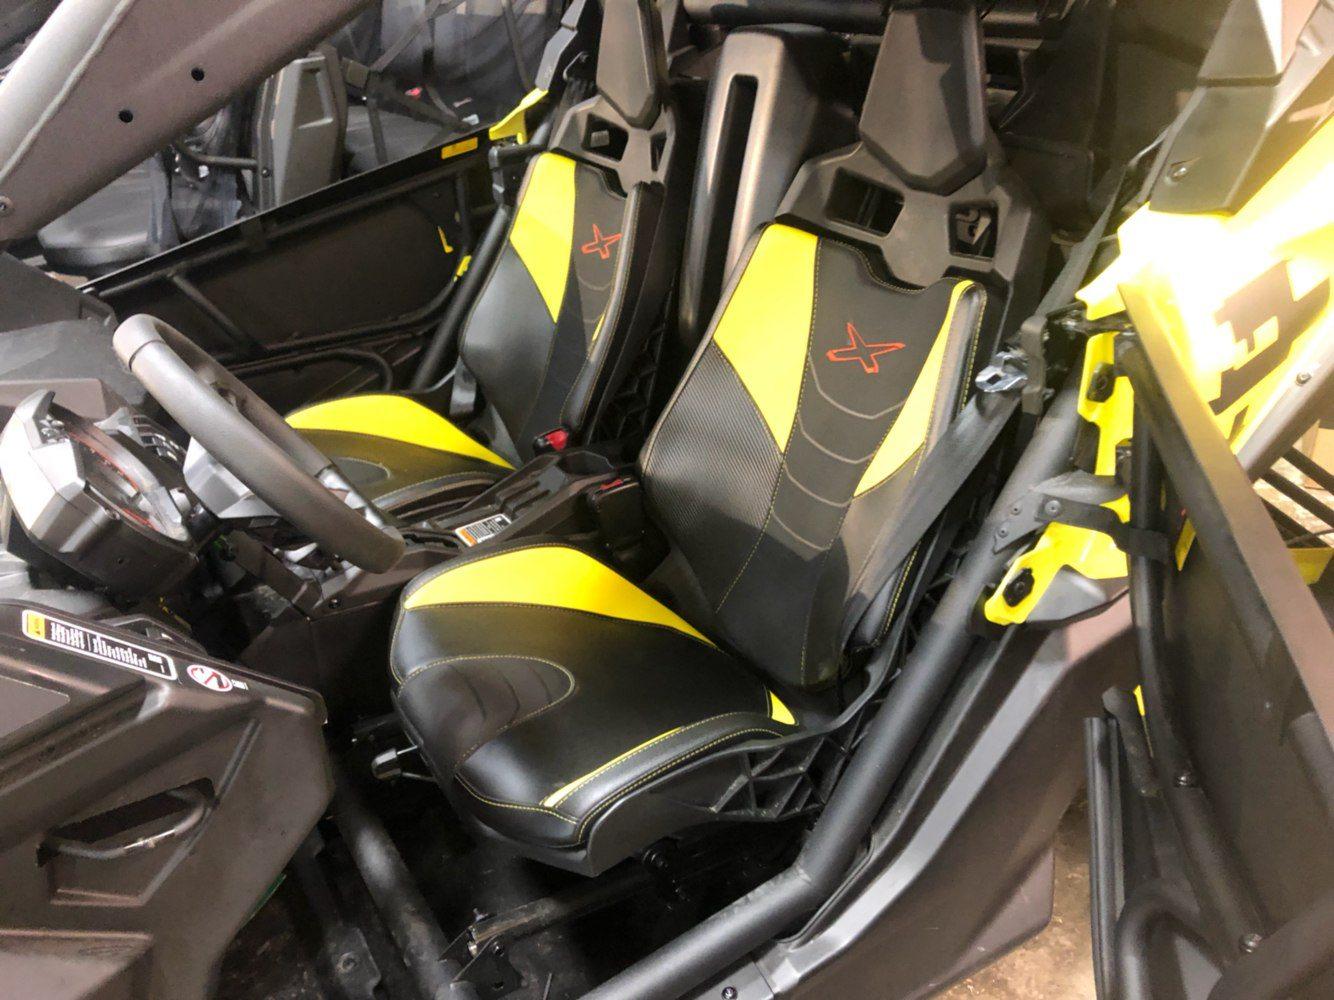 2019 Can-Am Maverick X3 X MR Turbo in Douglas, Georgia